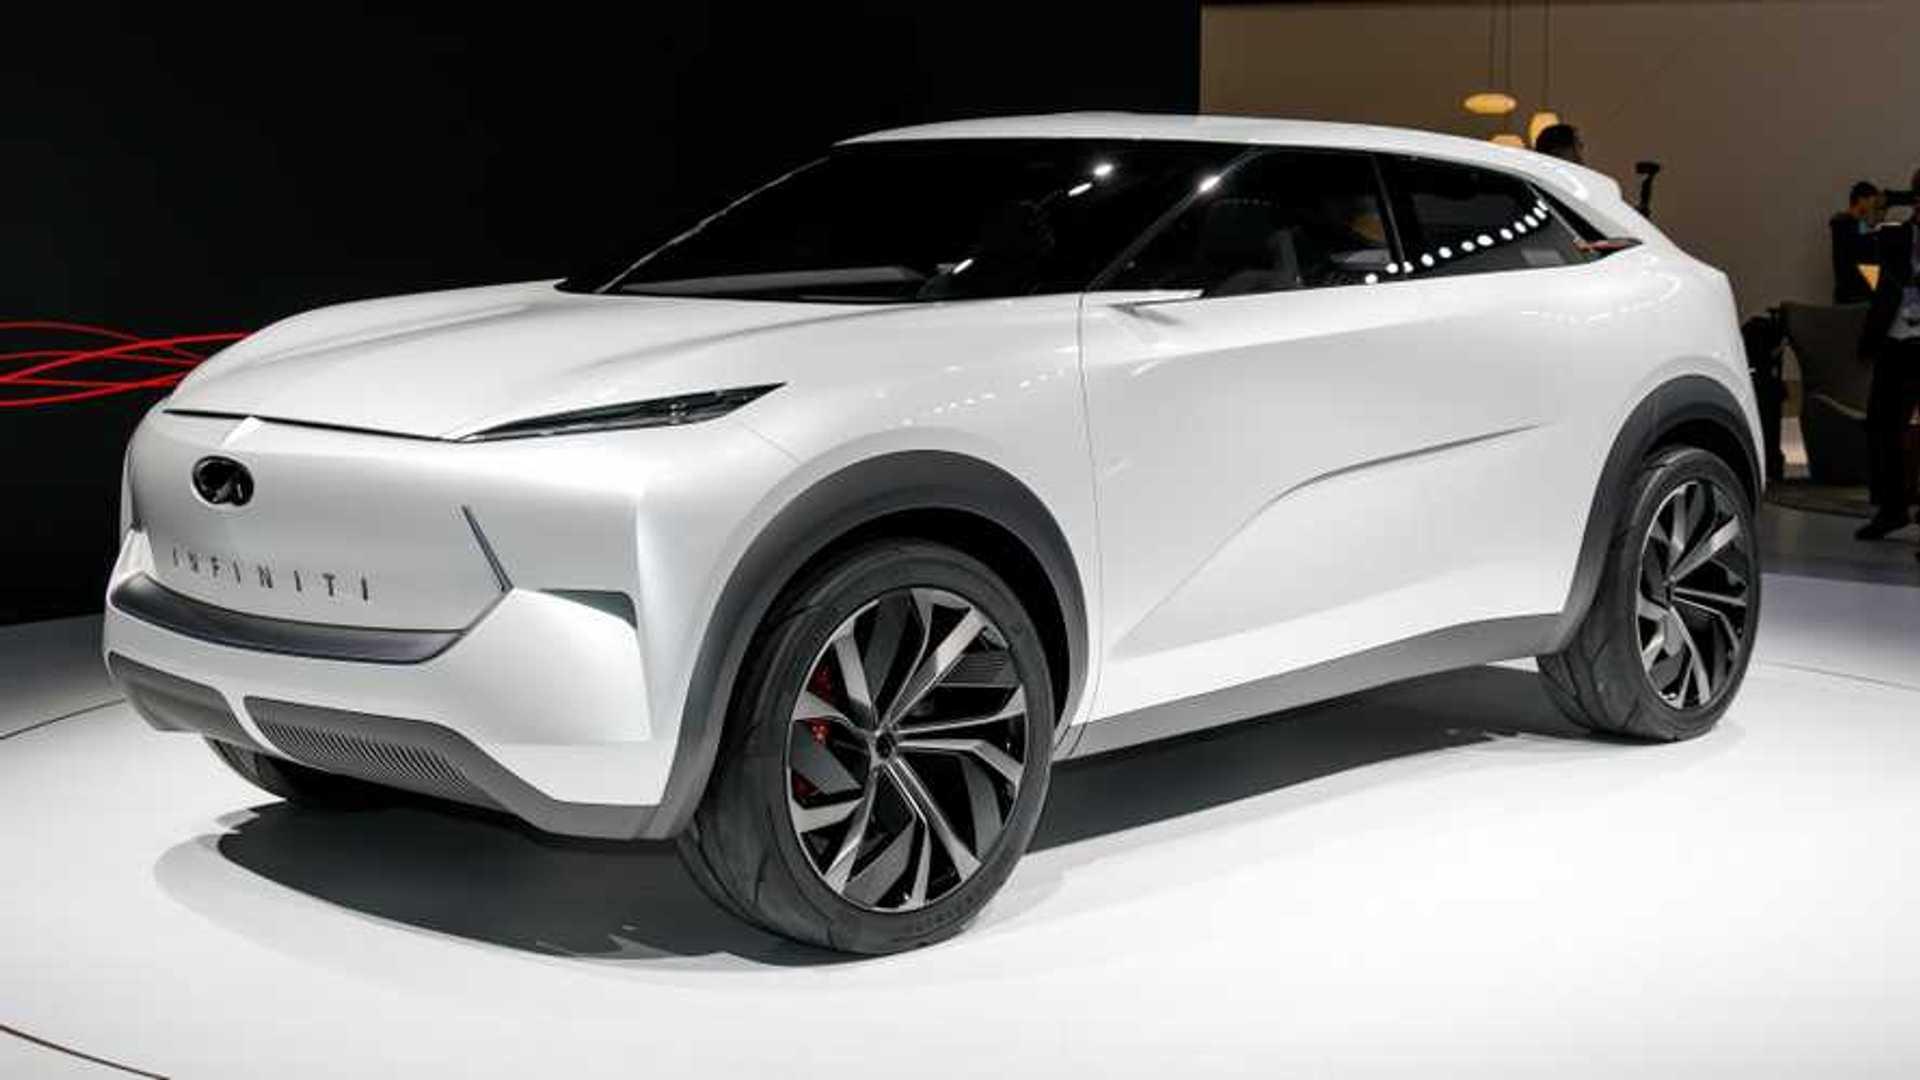 Infiniti Qx Inspiration Concept Foretells Brand S Electric Future Update